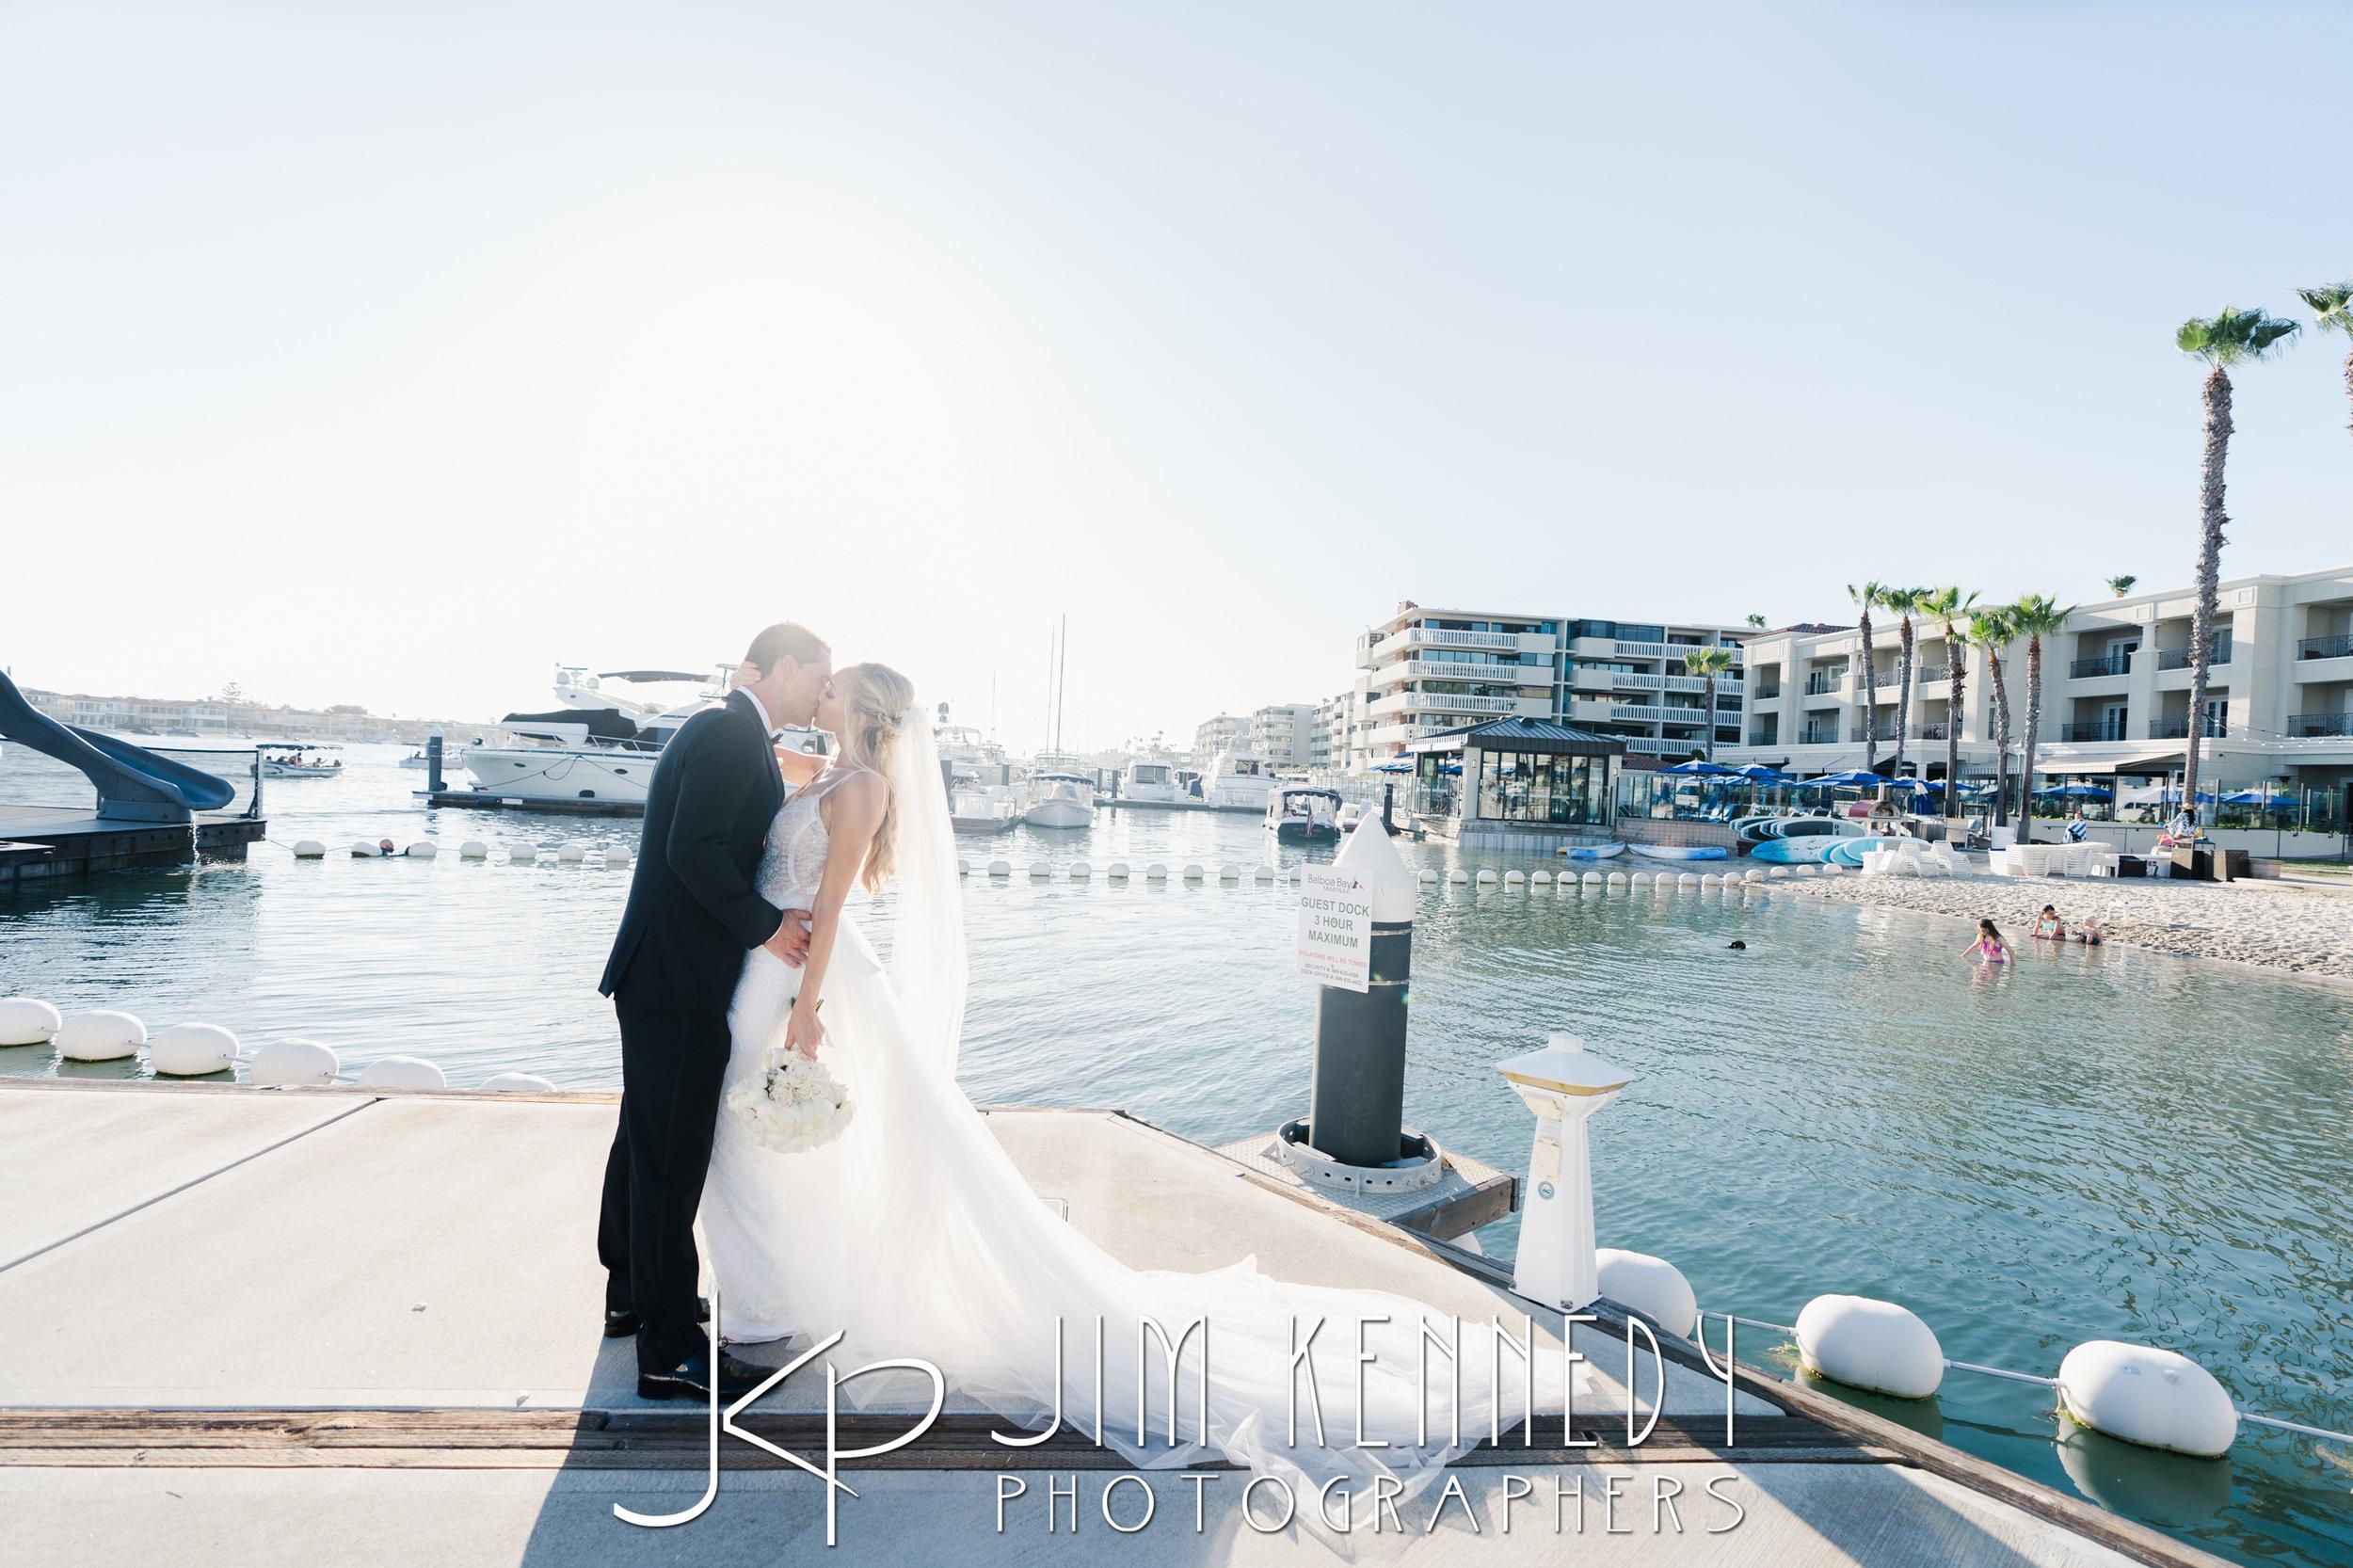 balboa-bay-resort-wedding-brooke-kevin_0144.JPG